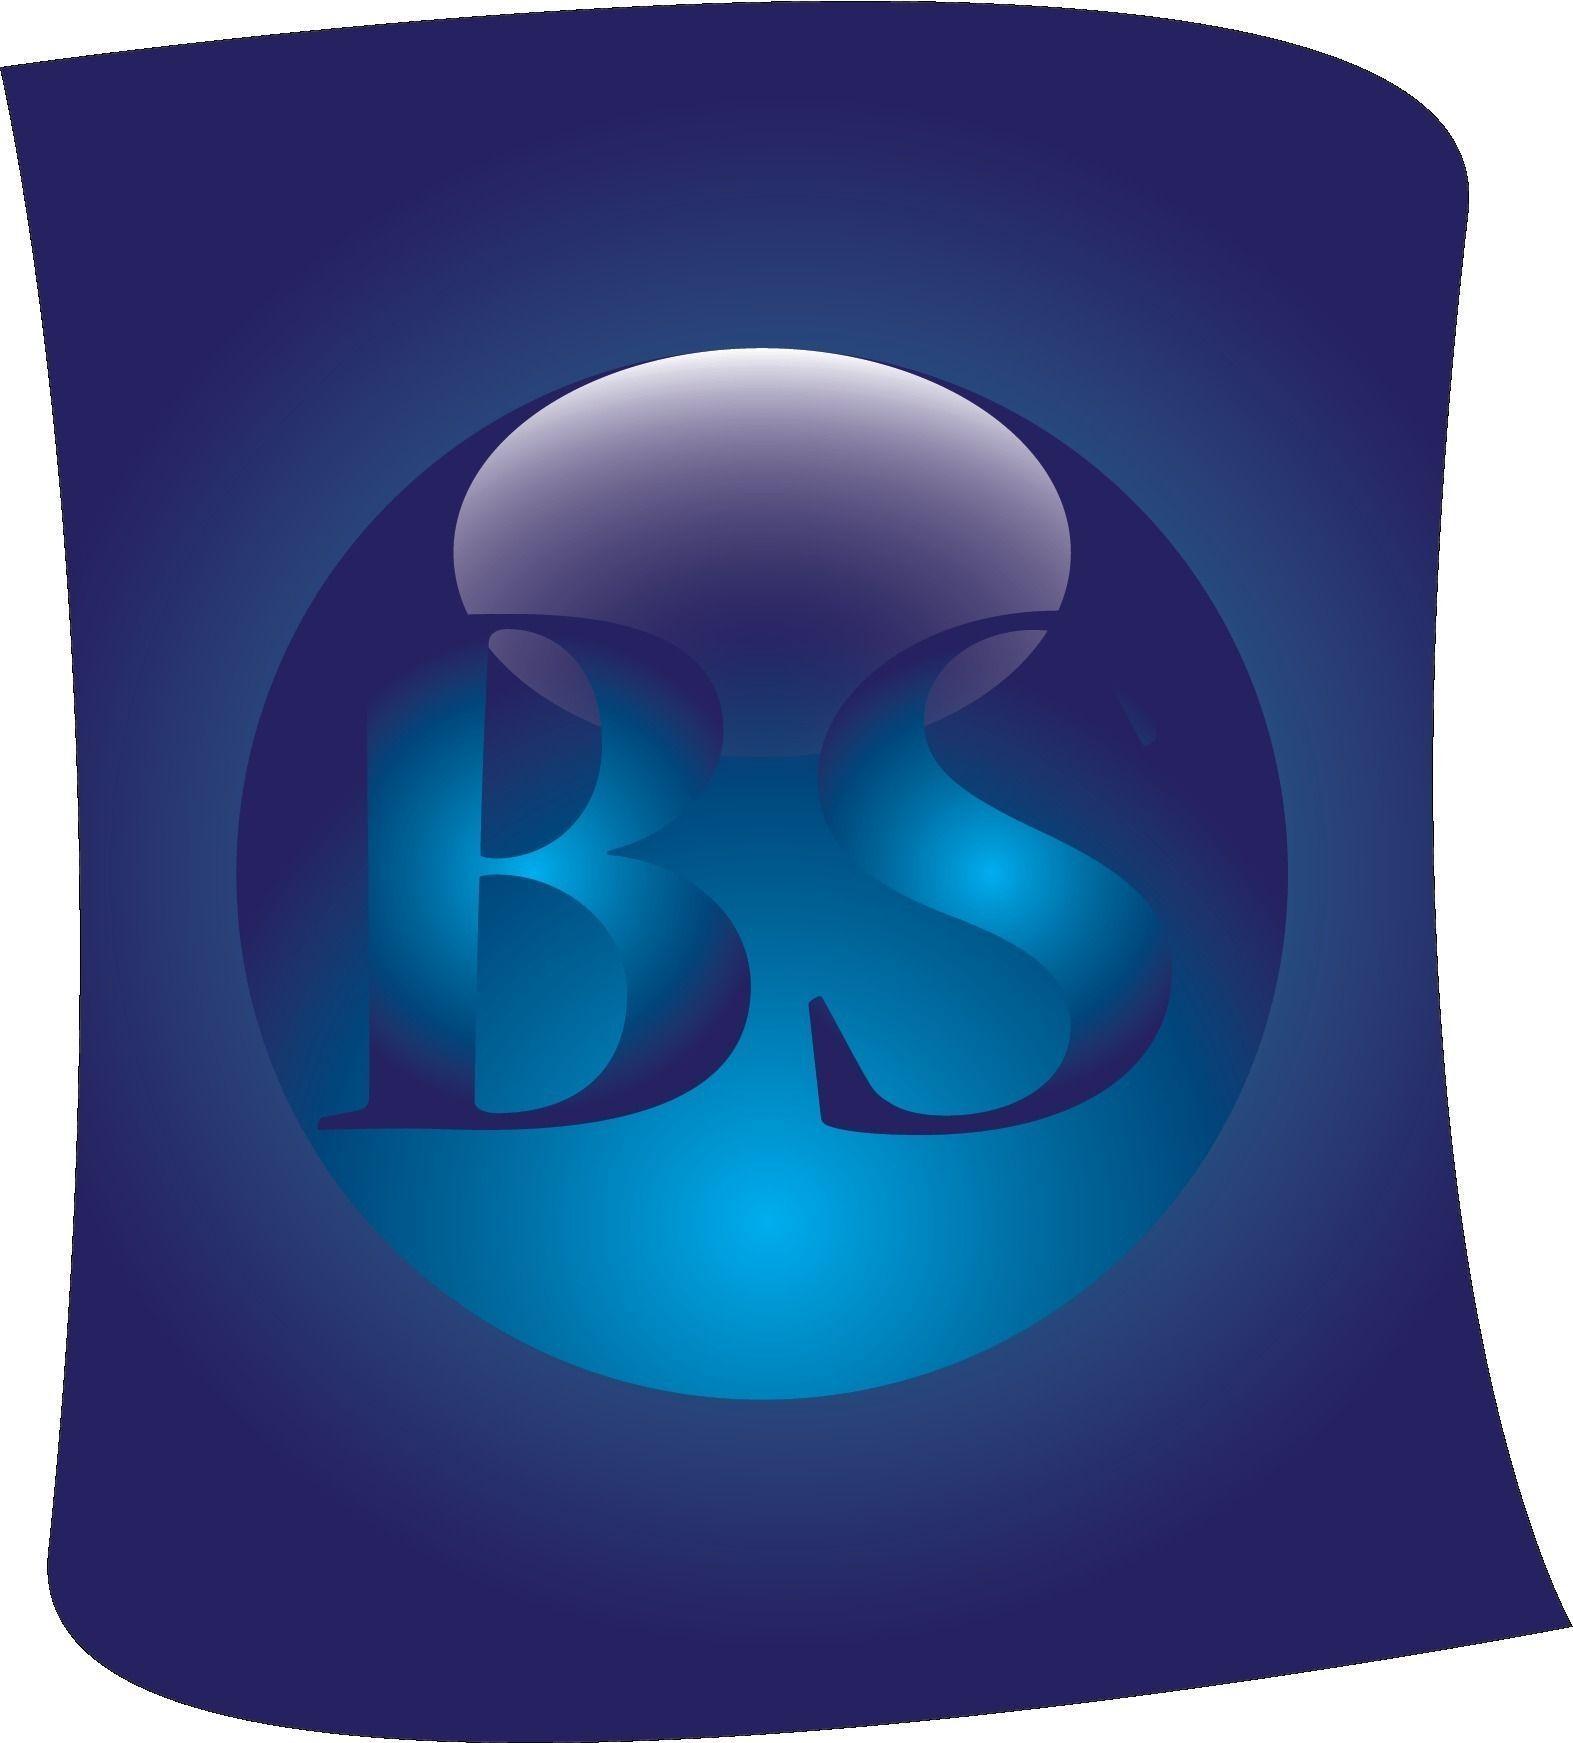 Biswajit25